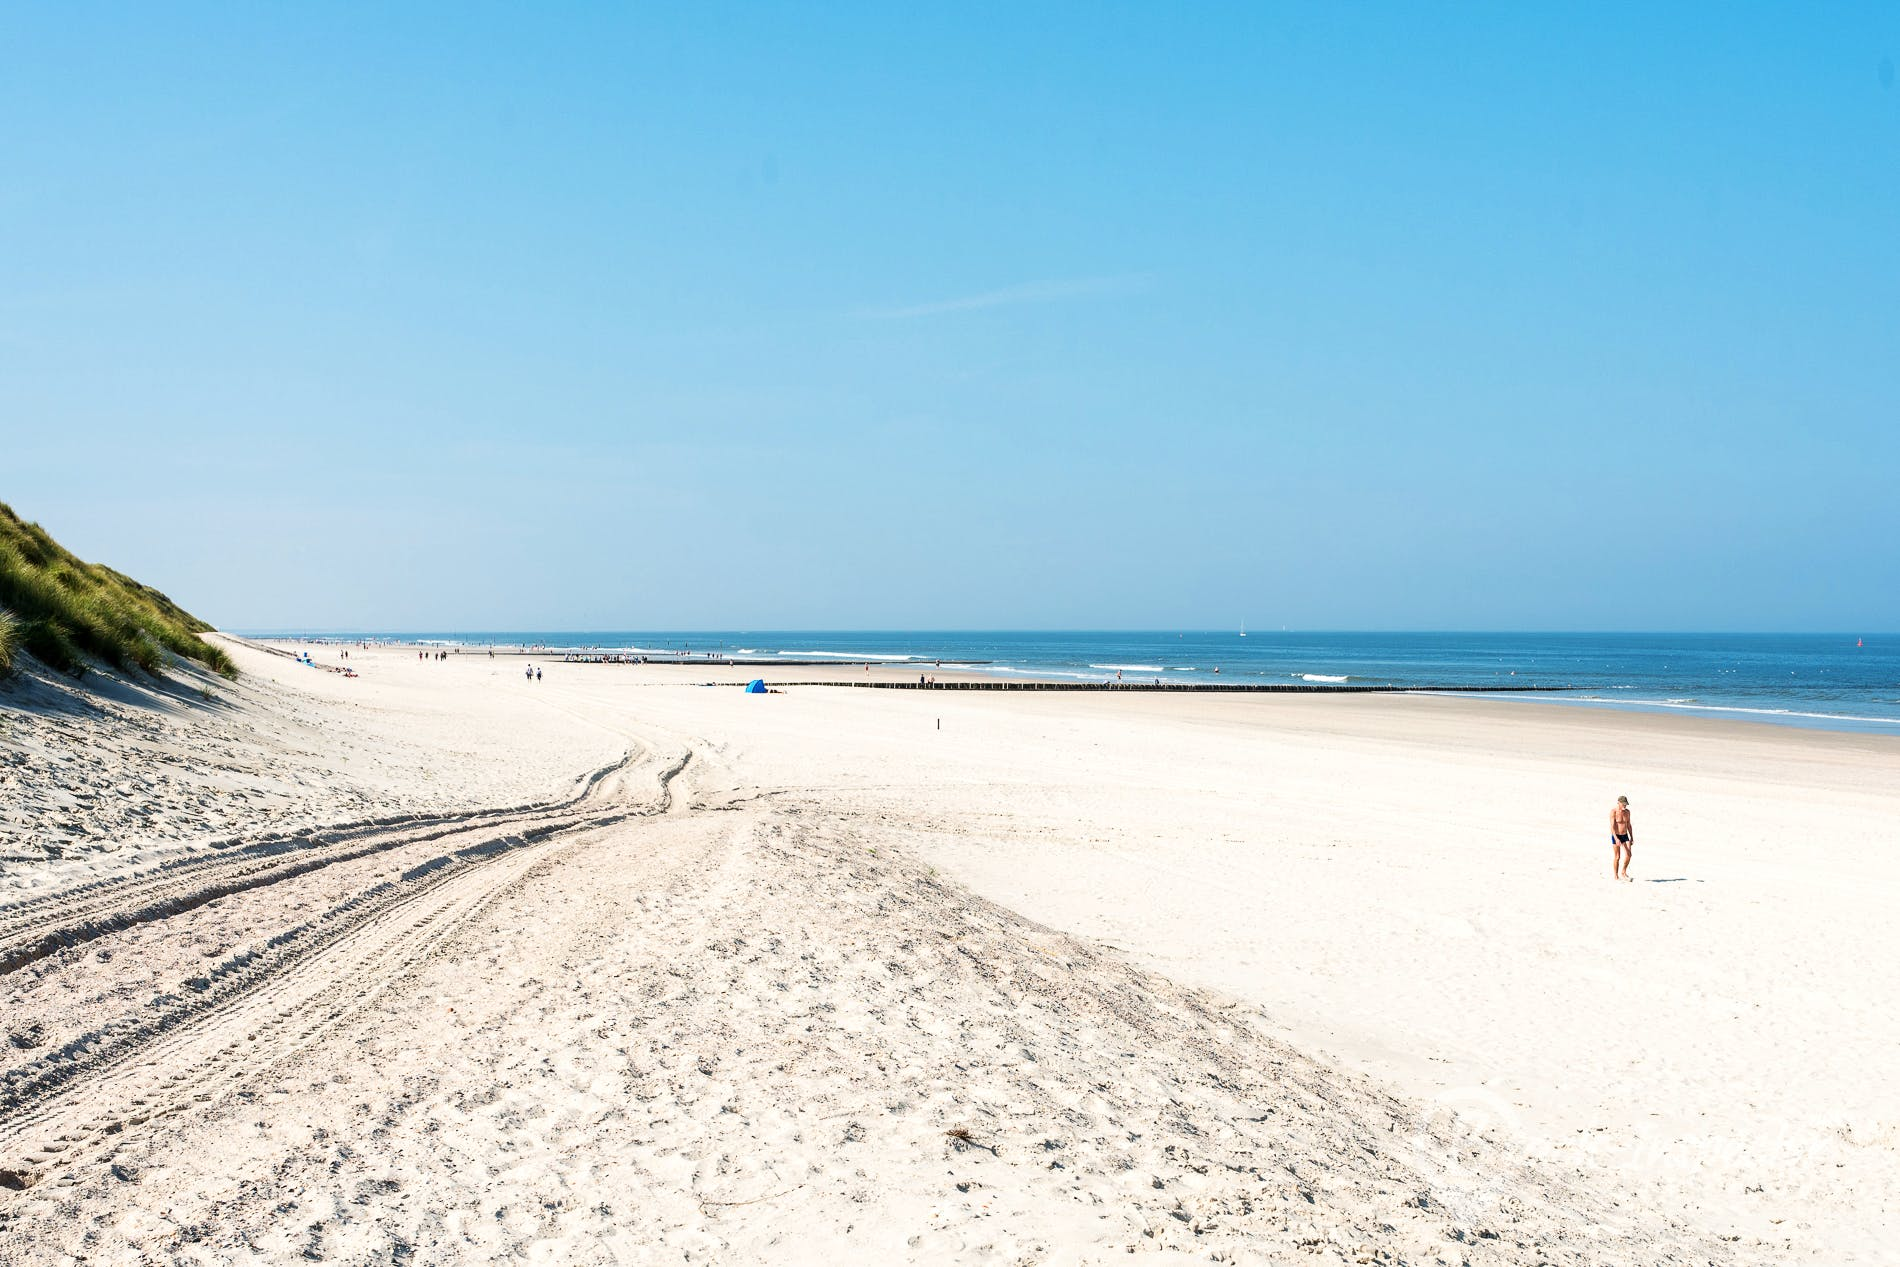 Strand Lippestrand, Norderney, Deutschland